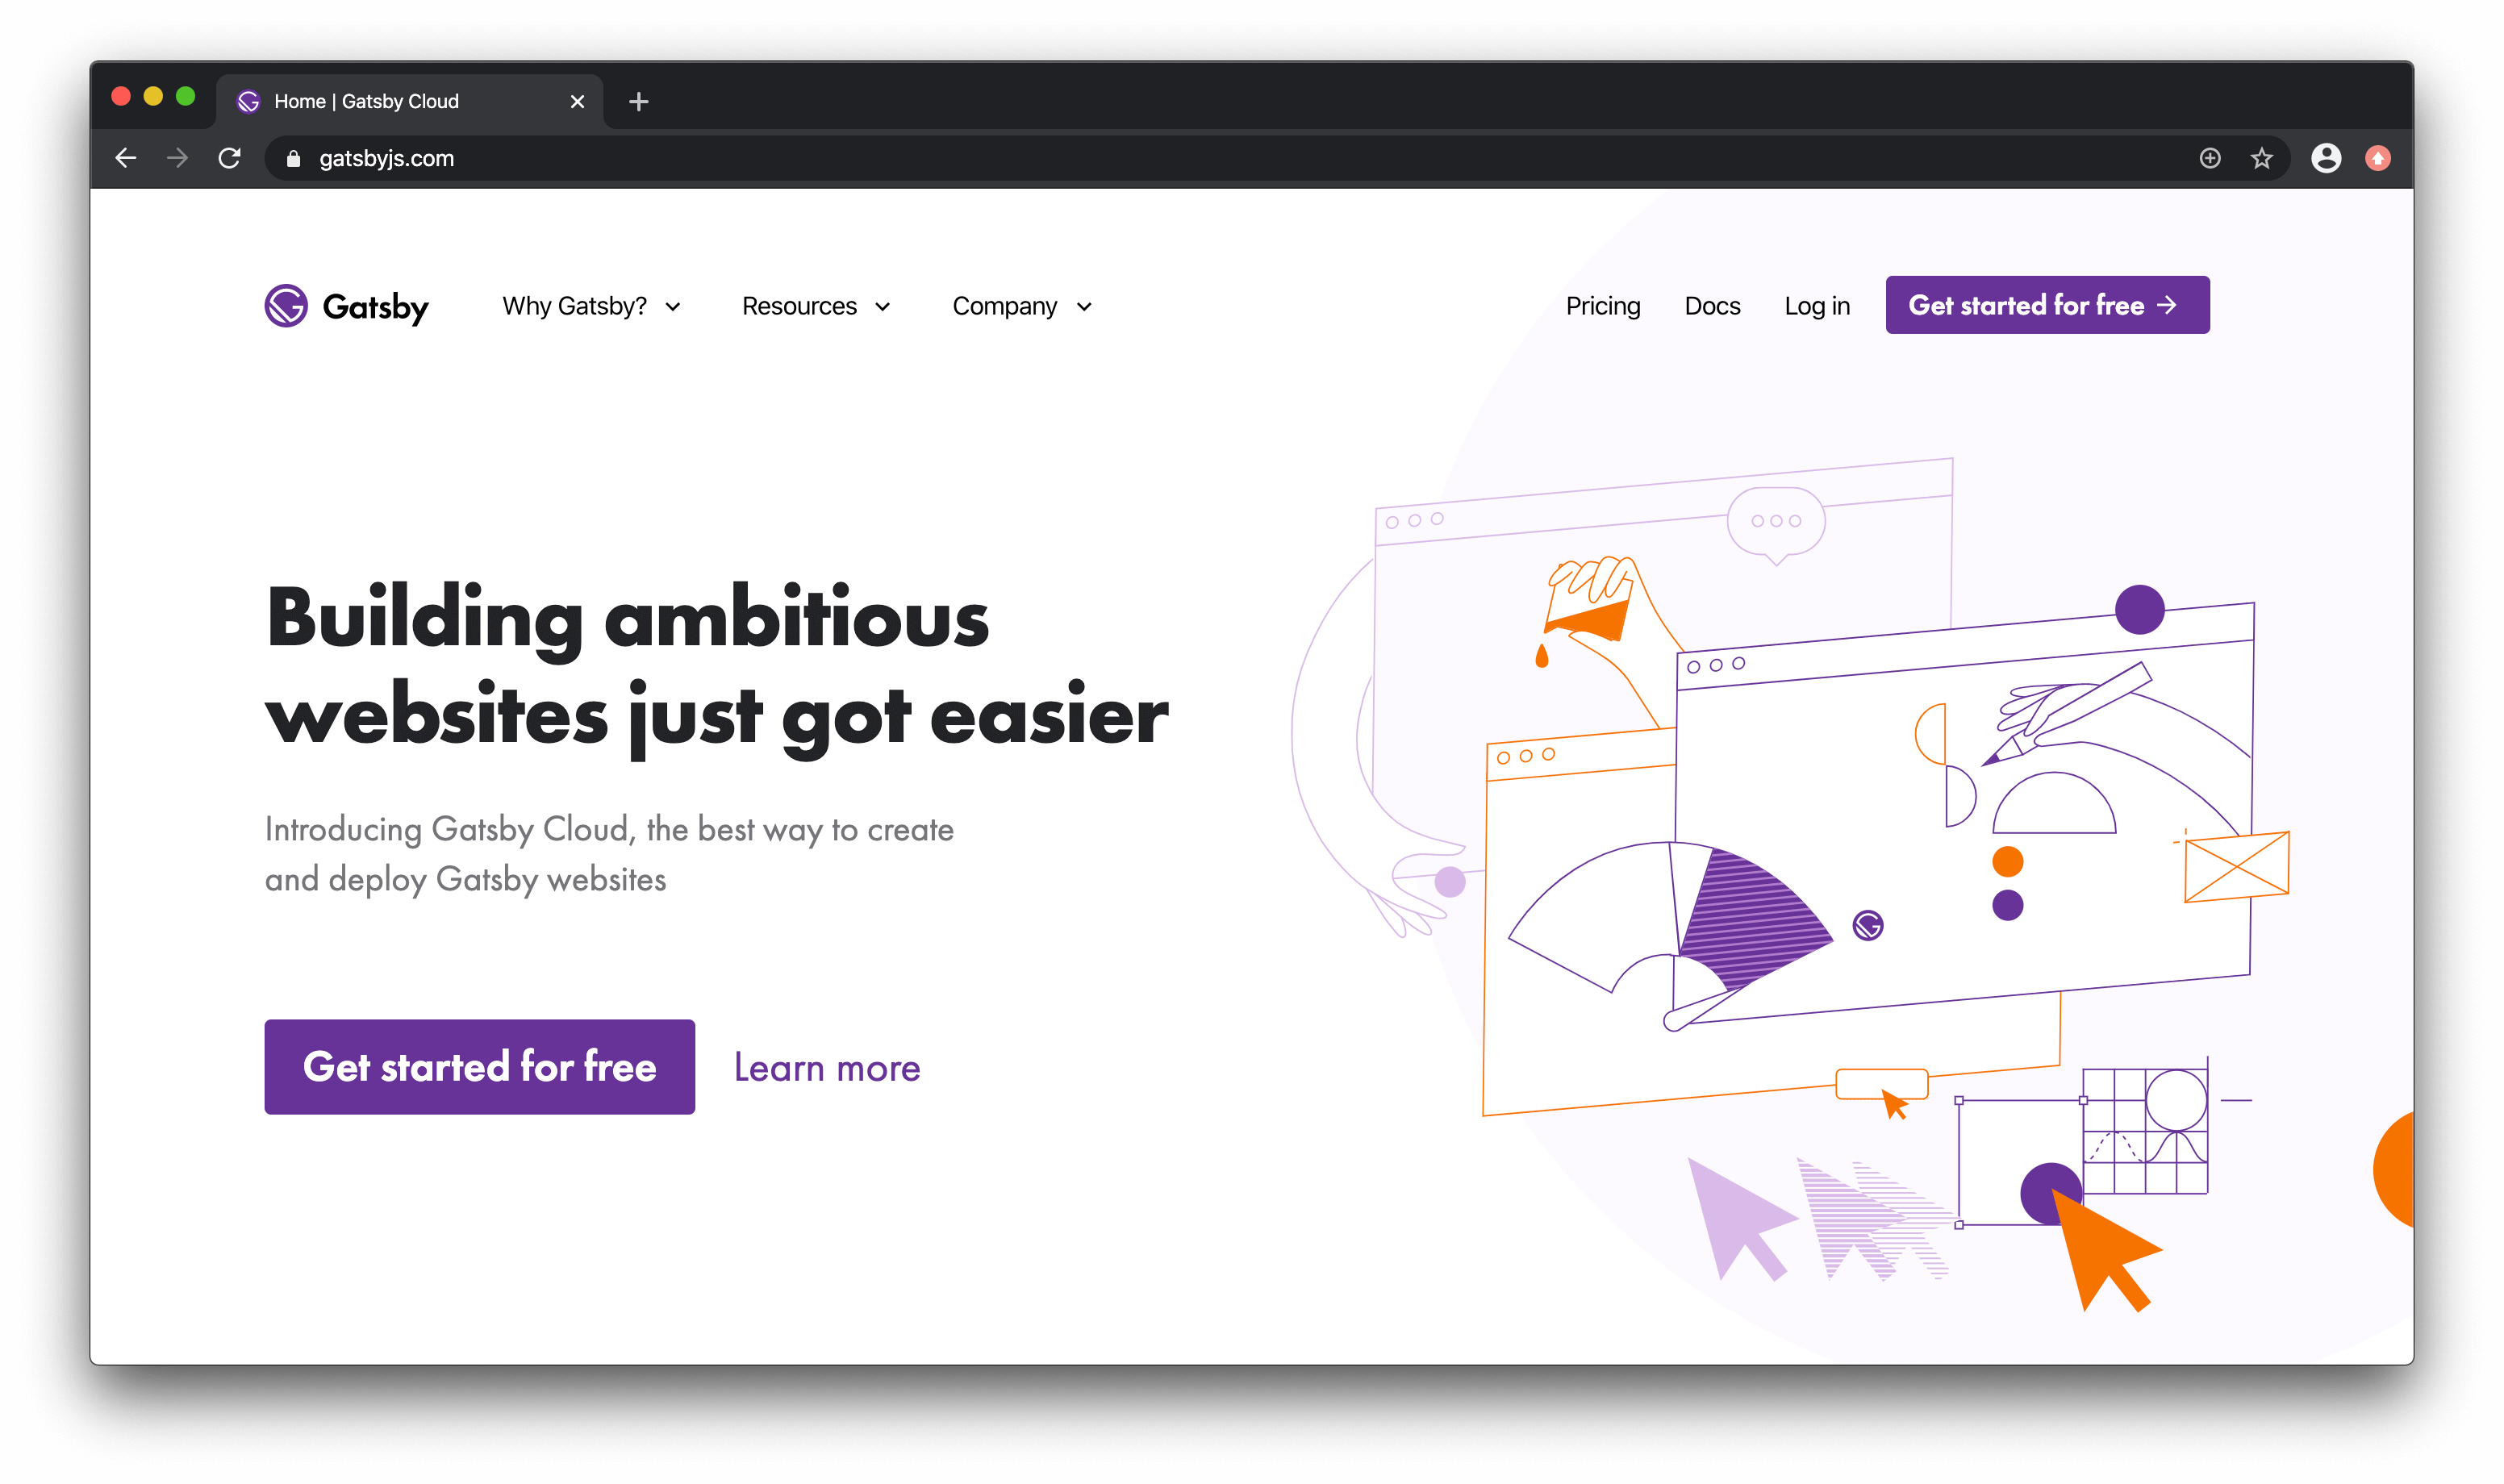 Gatsby Cloud homepage